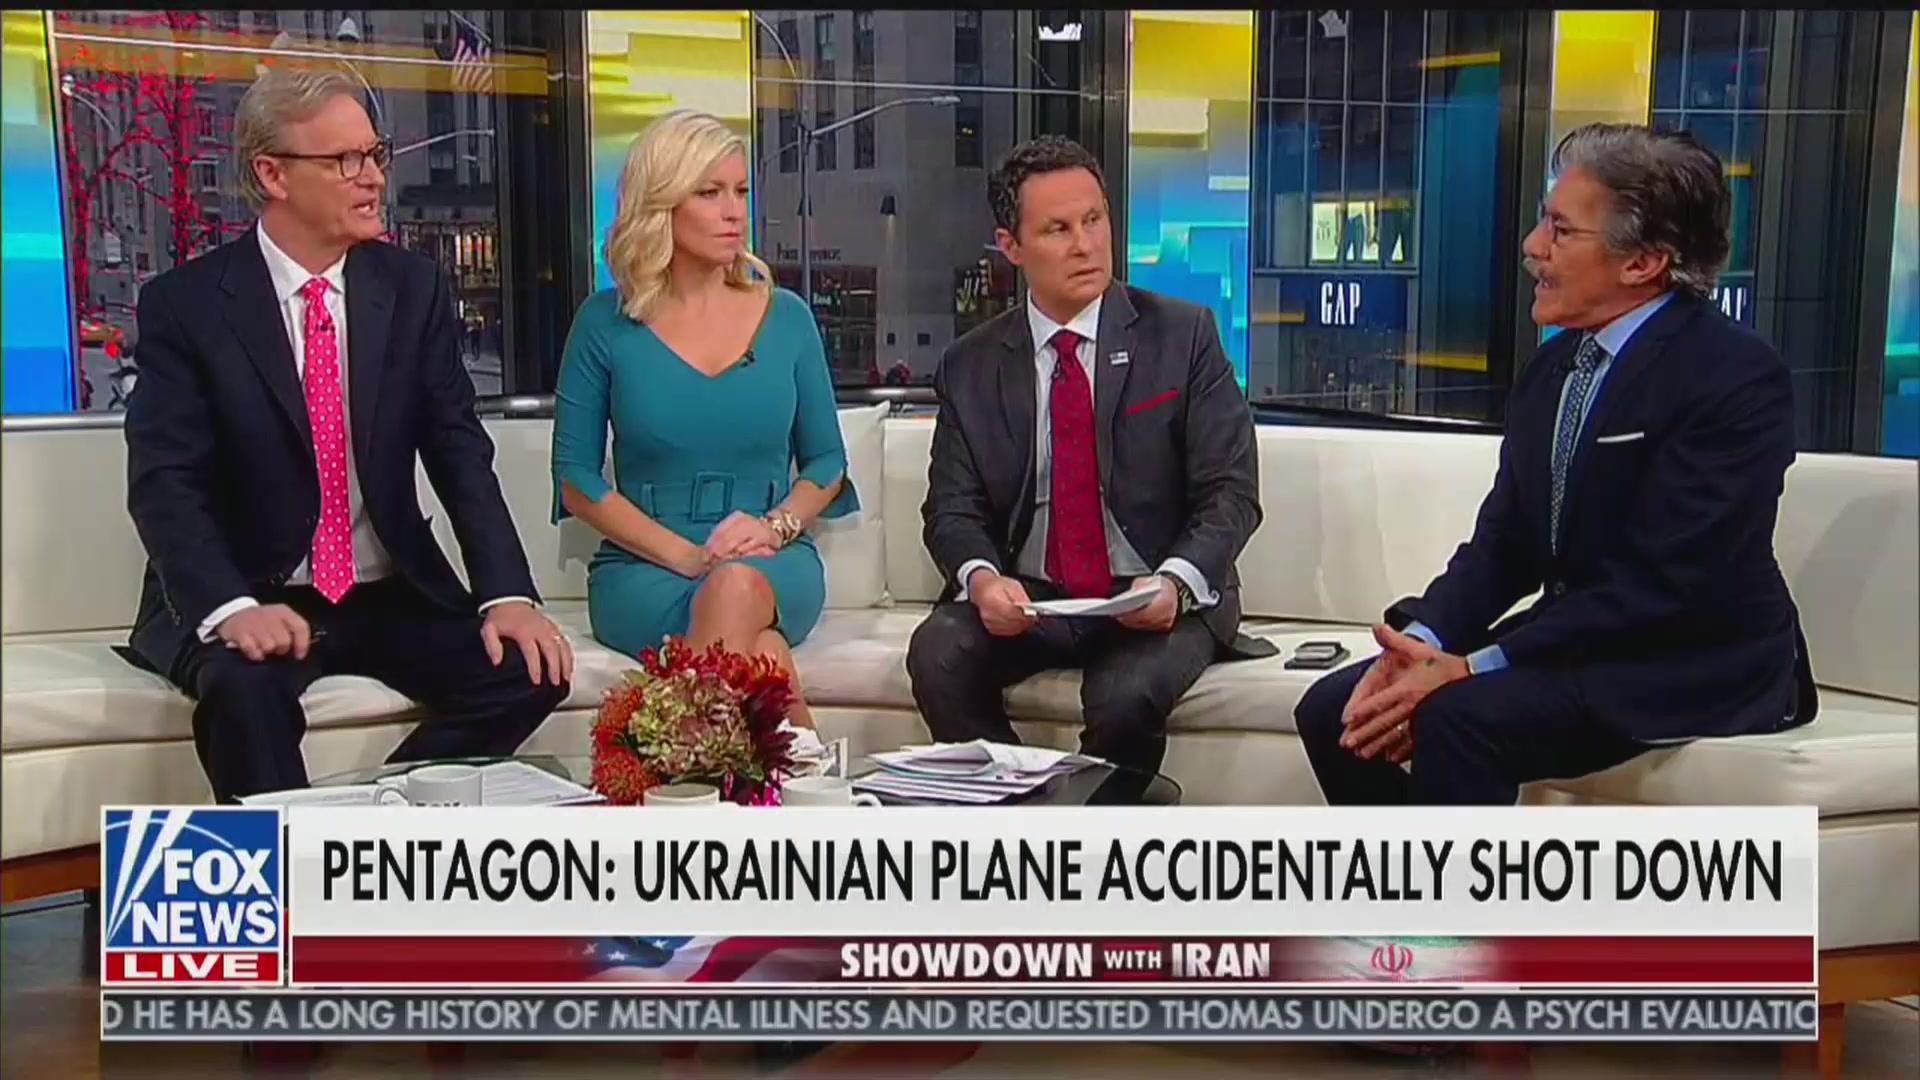 Fox & Friends Host Wonders: Can You Imagine If America 'Accidentally Shot Down' a Civilian Plane?